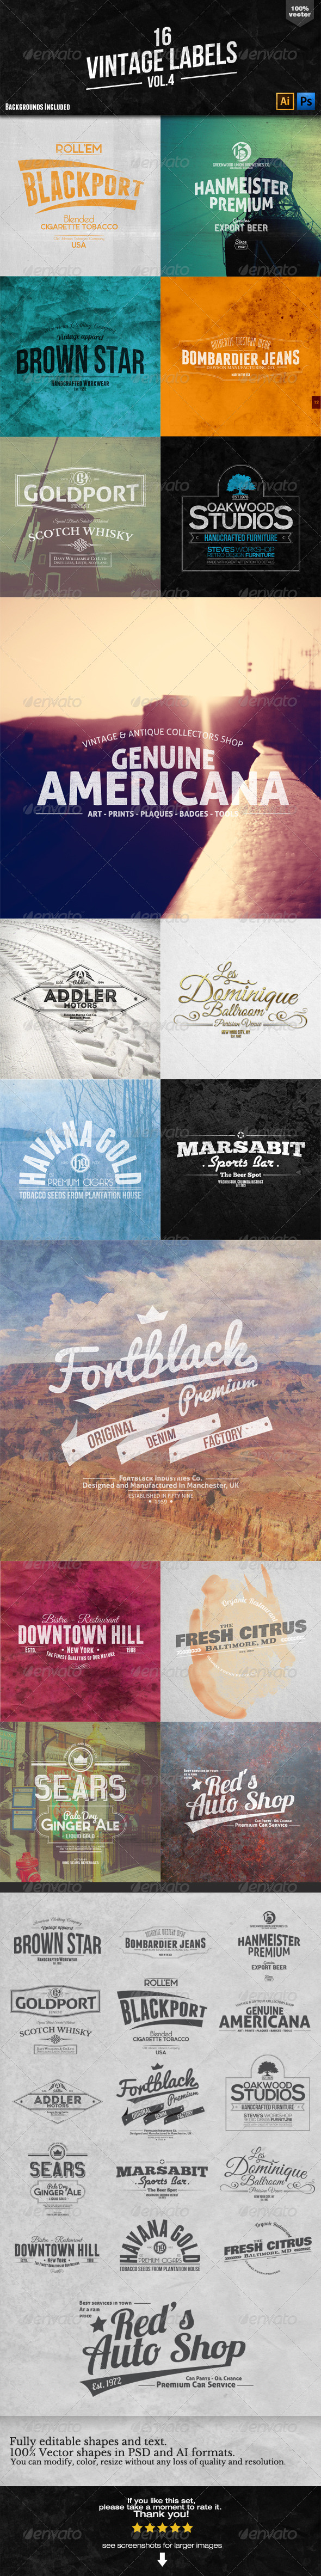 GraphicRiver 16 Vintage Labels and Badges Vol.4 6410345